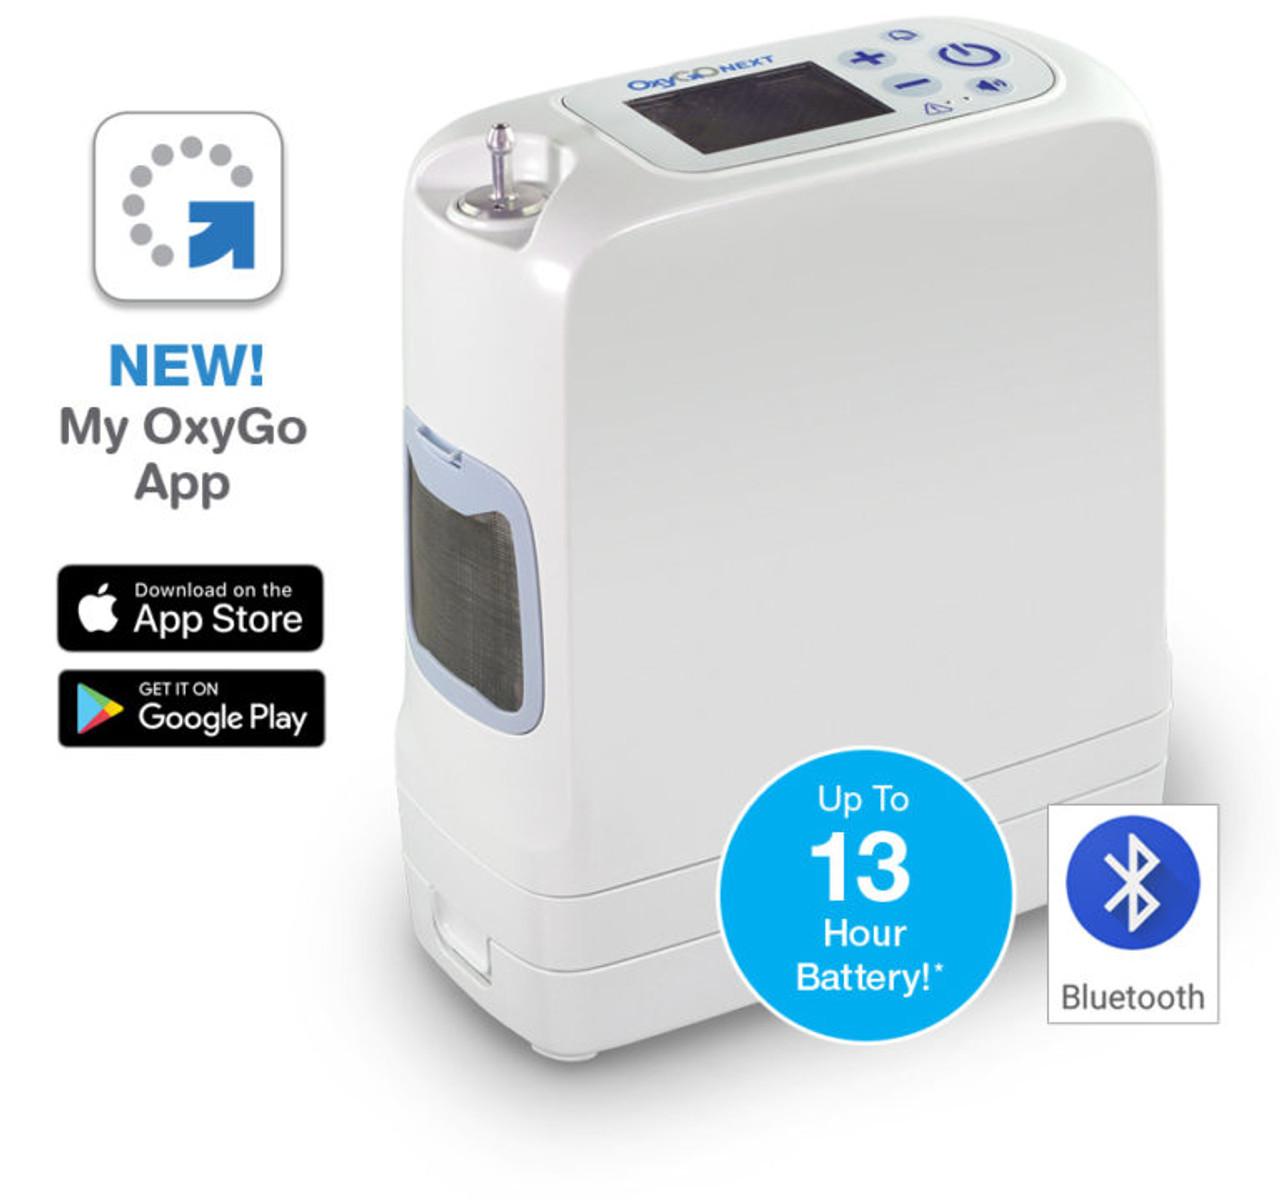 OxyGo NEXT Portable Oxygen Concentrator